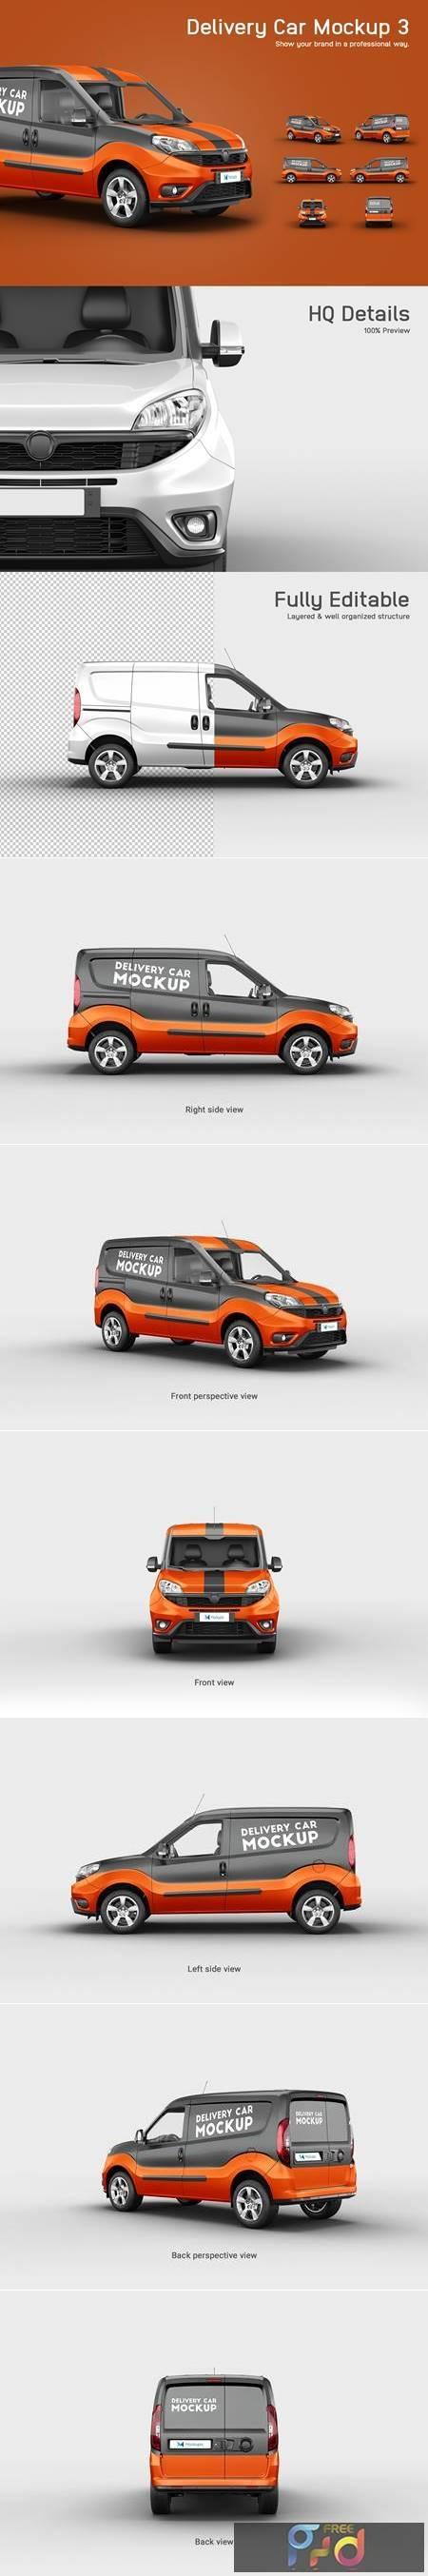 Delivery Car Mockup 3 4876078 1